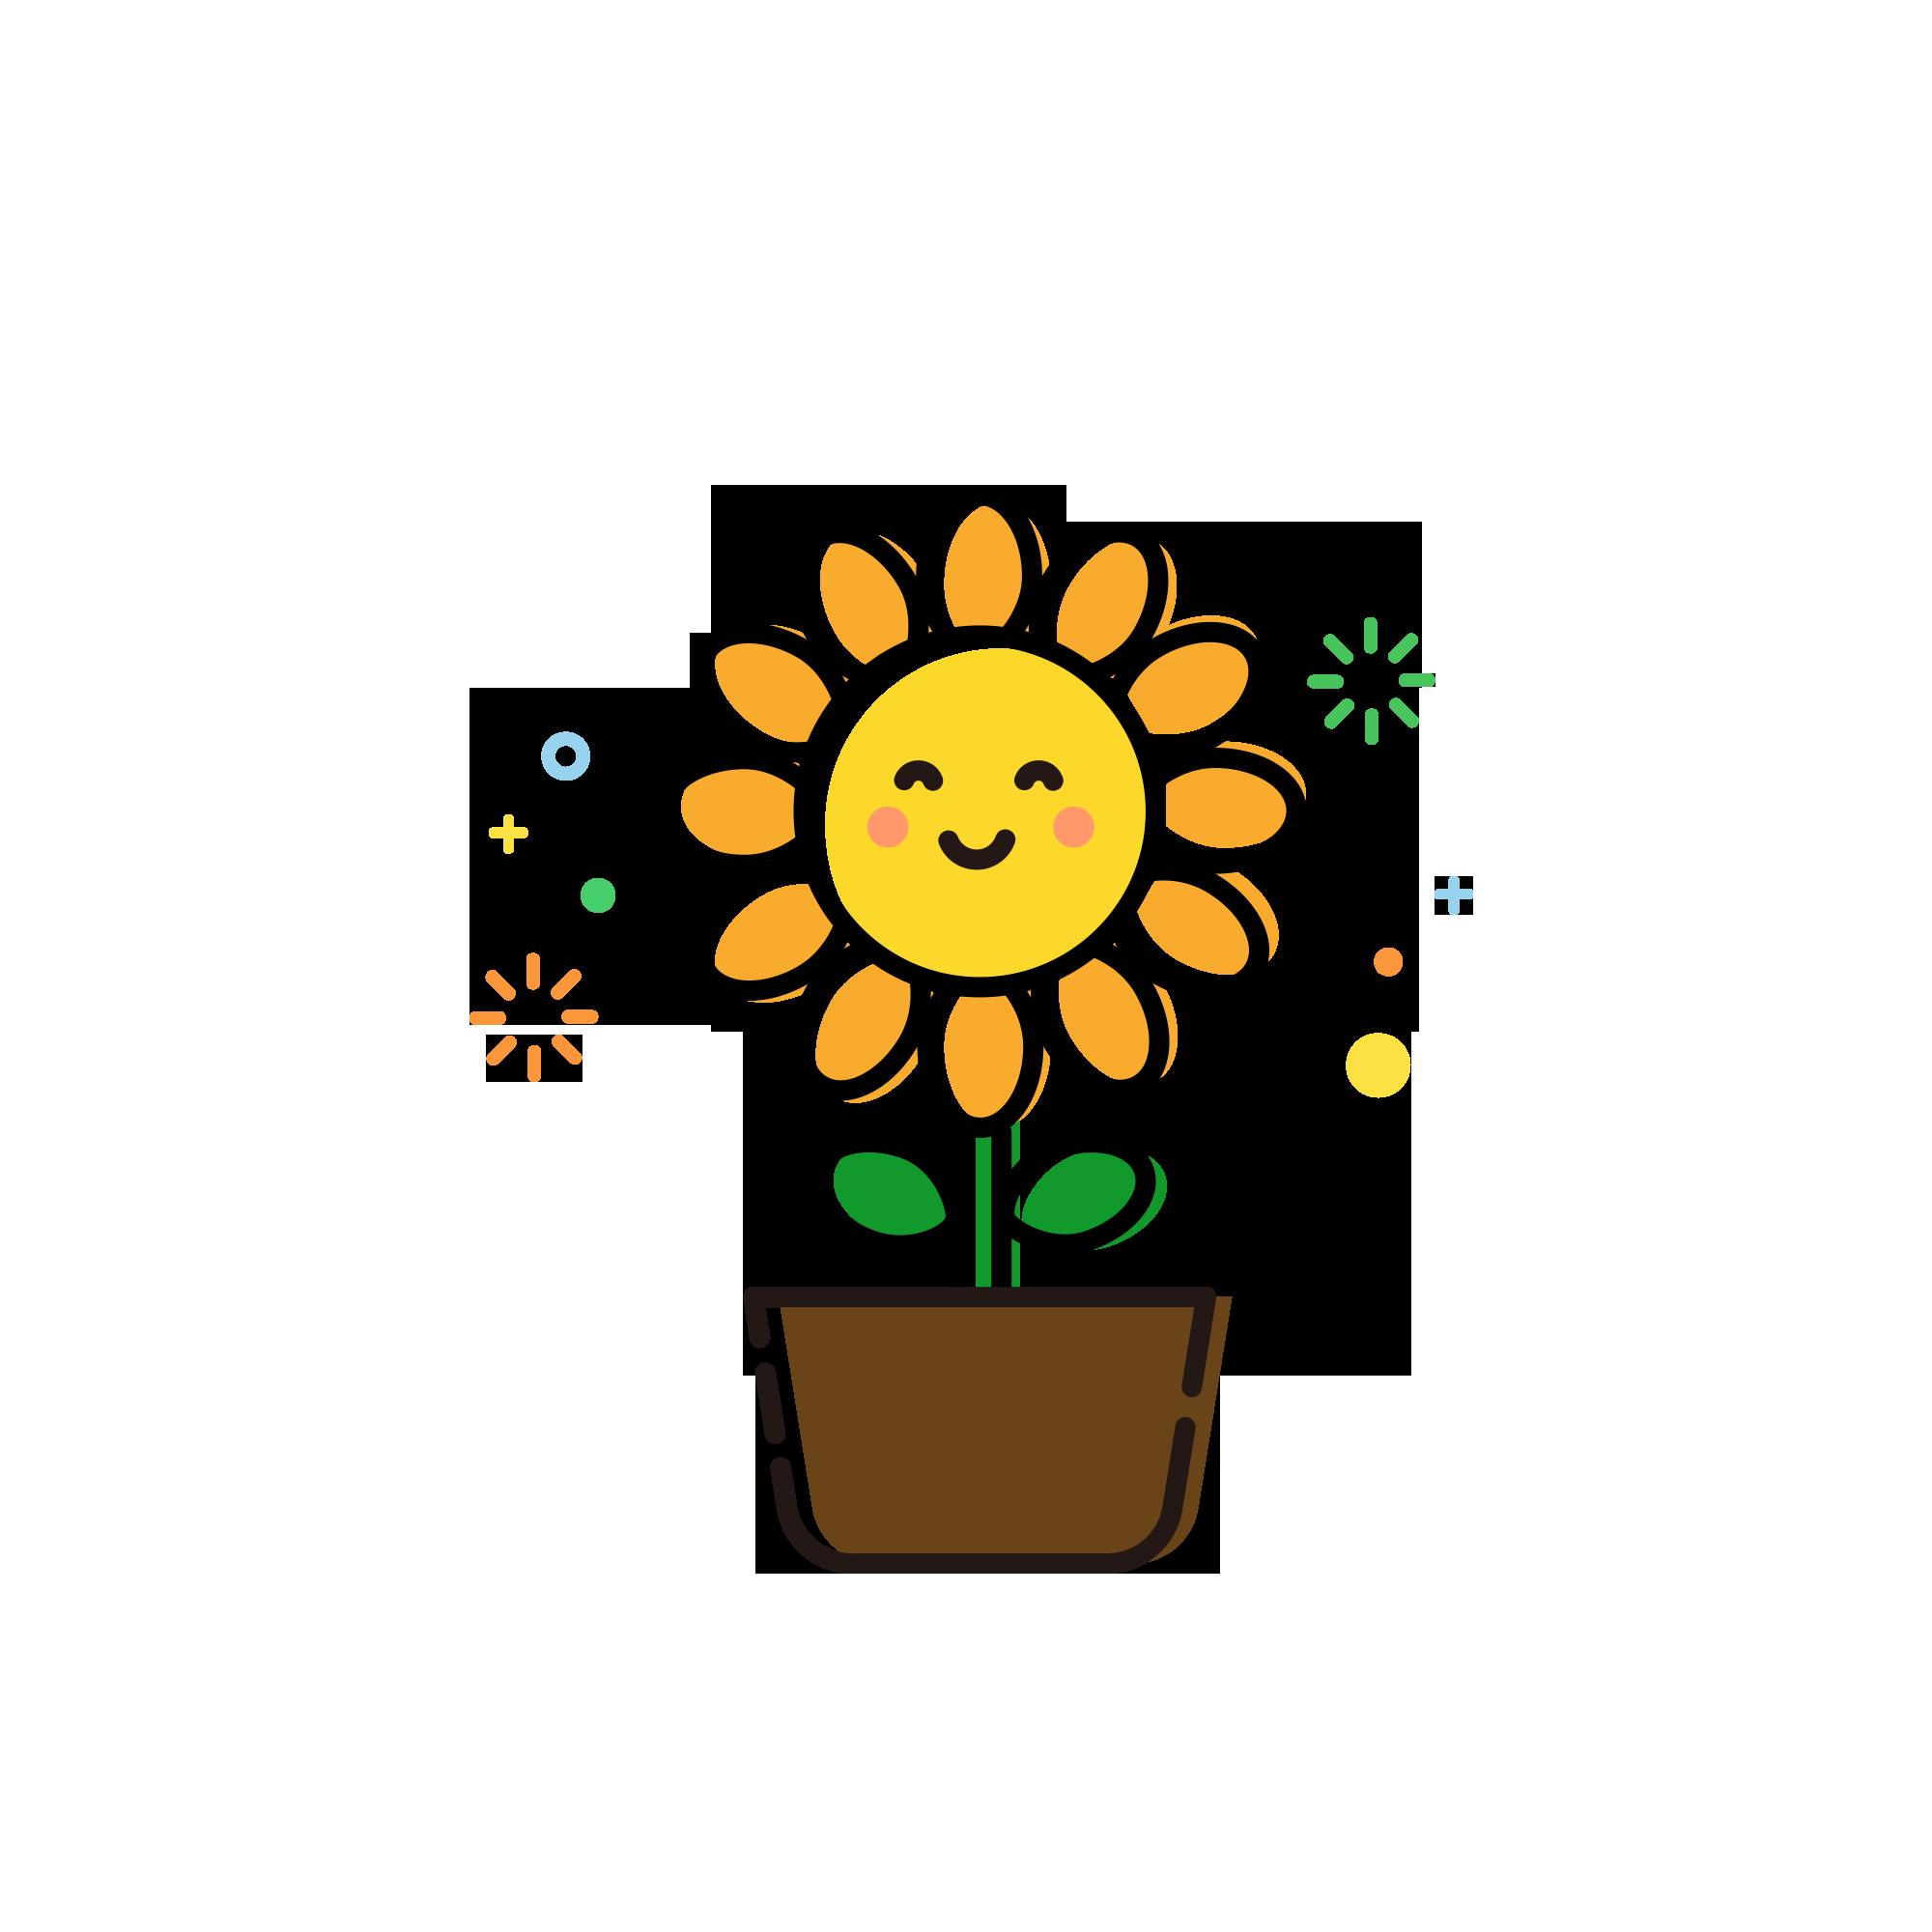 Pngtreembeplanticonpottedsunflower_4047321